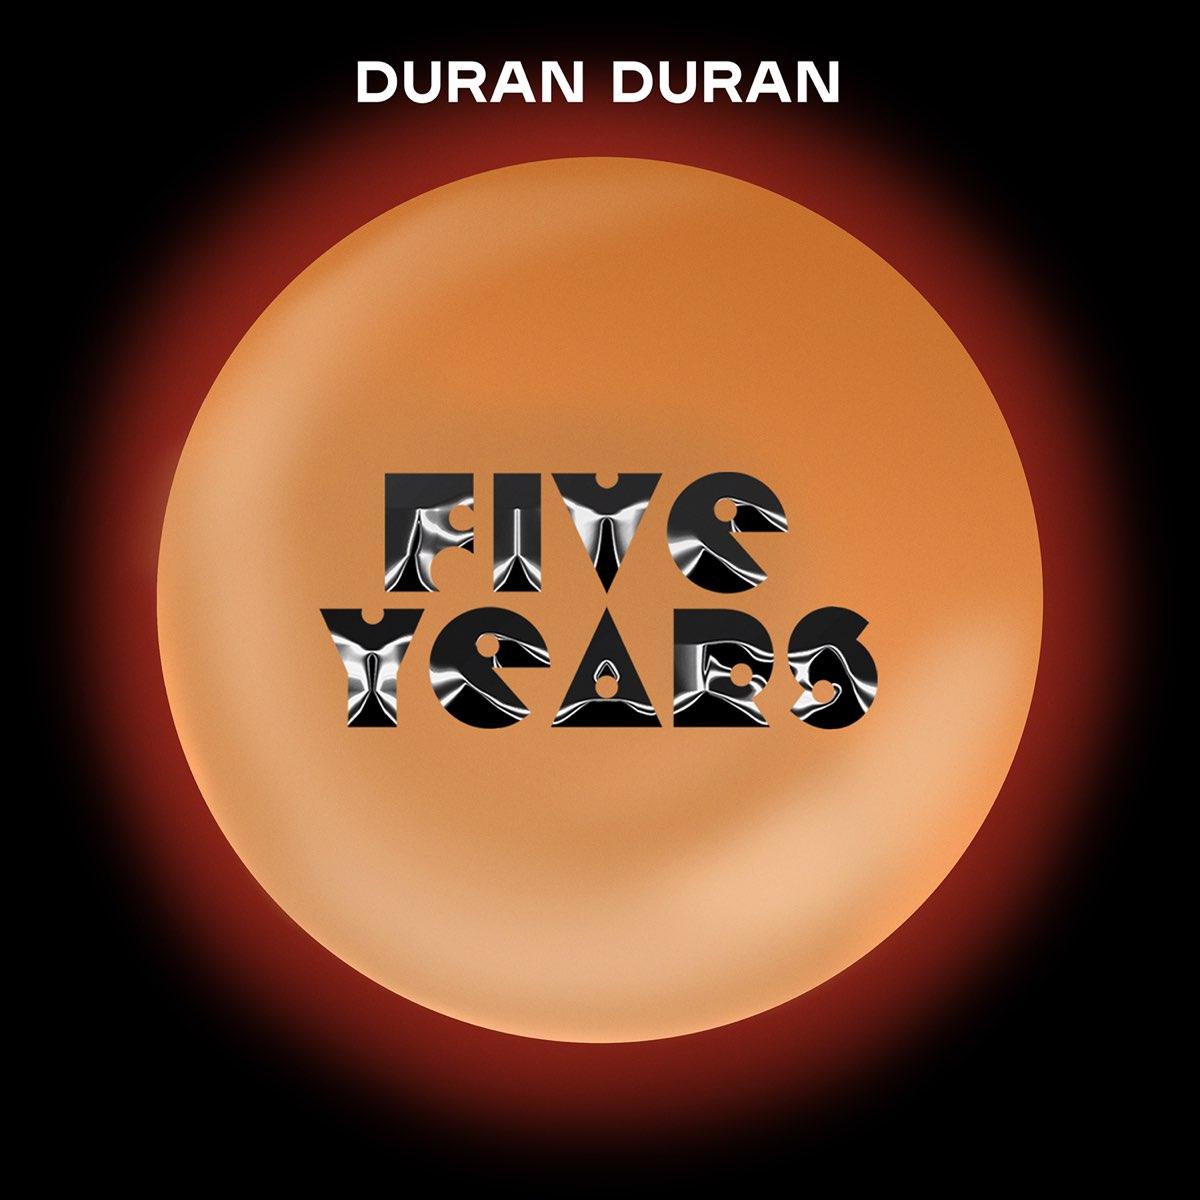 Duran Duran - Five Years album cover